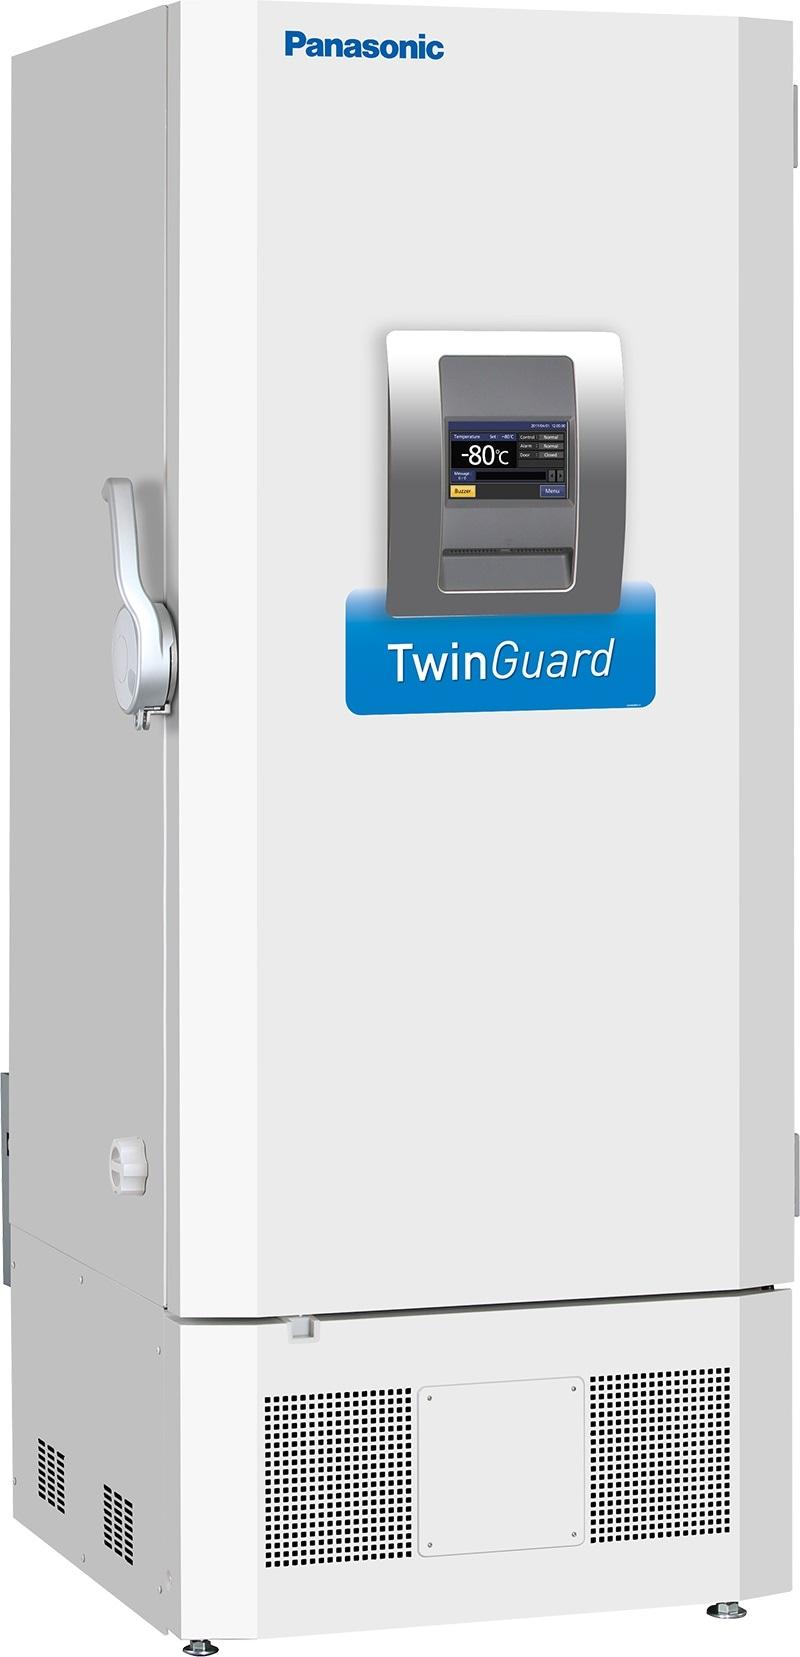 TwinGuard freezer range from Panasonic enable secure sample